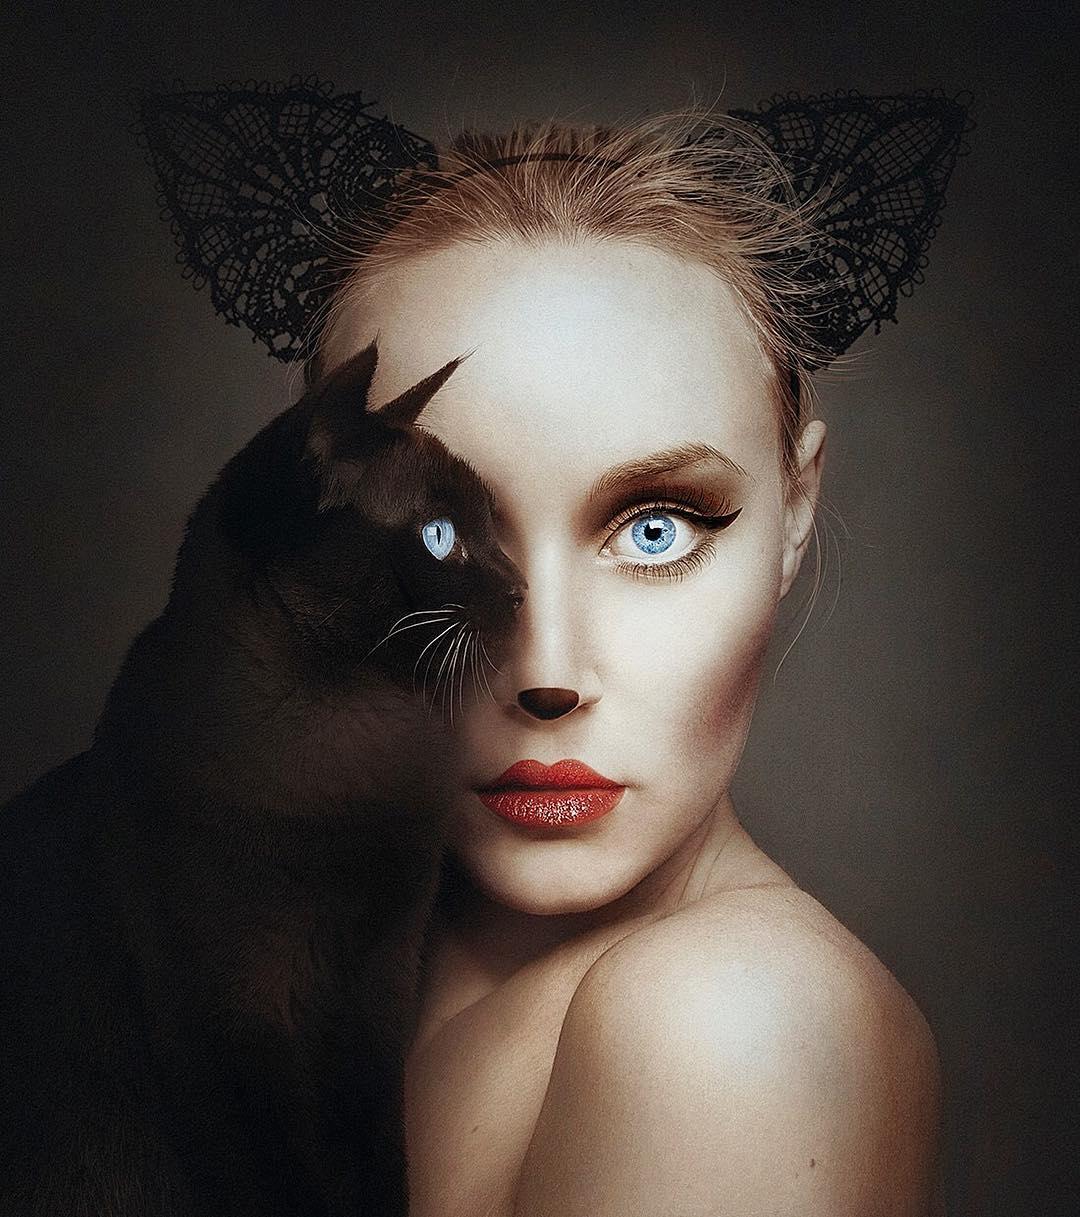 combines_human_and_animal_8